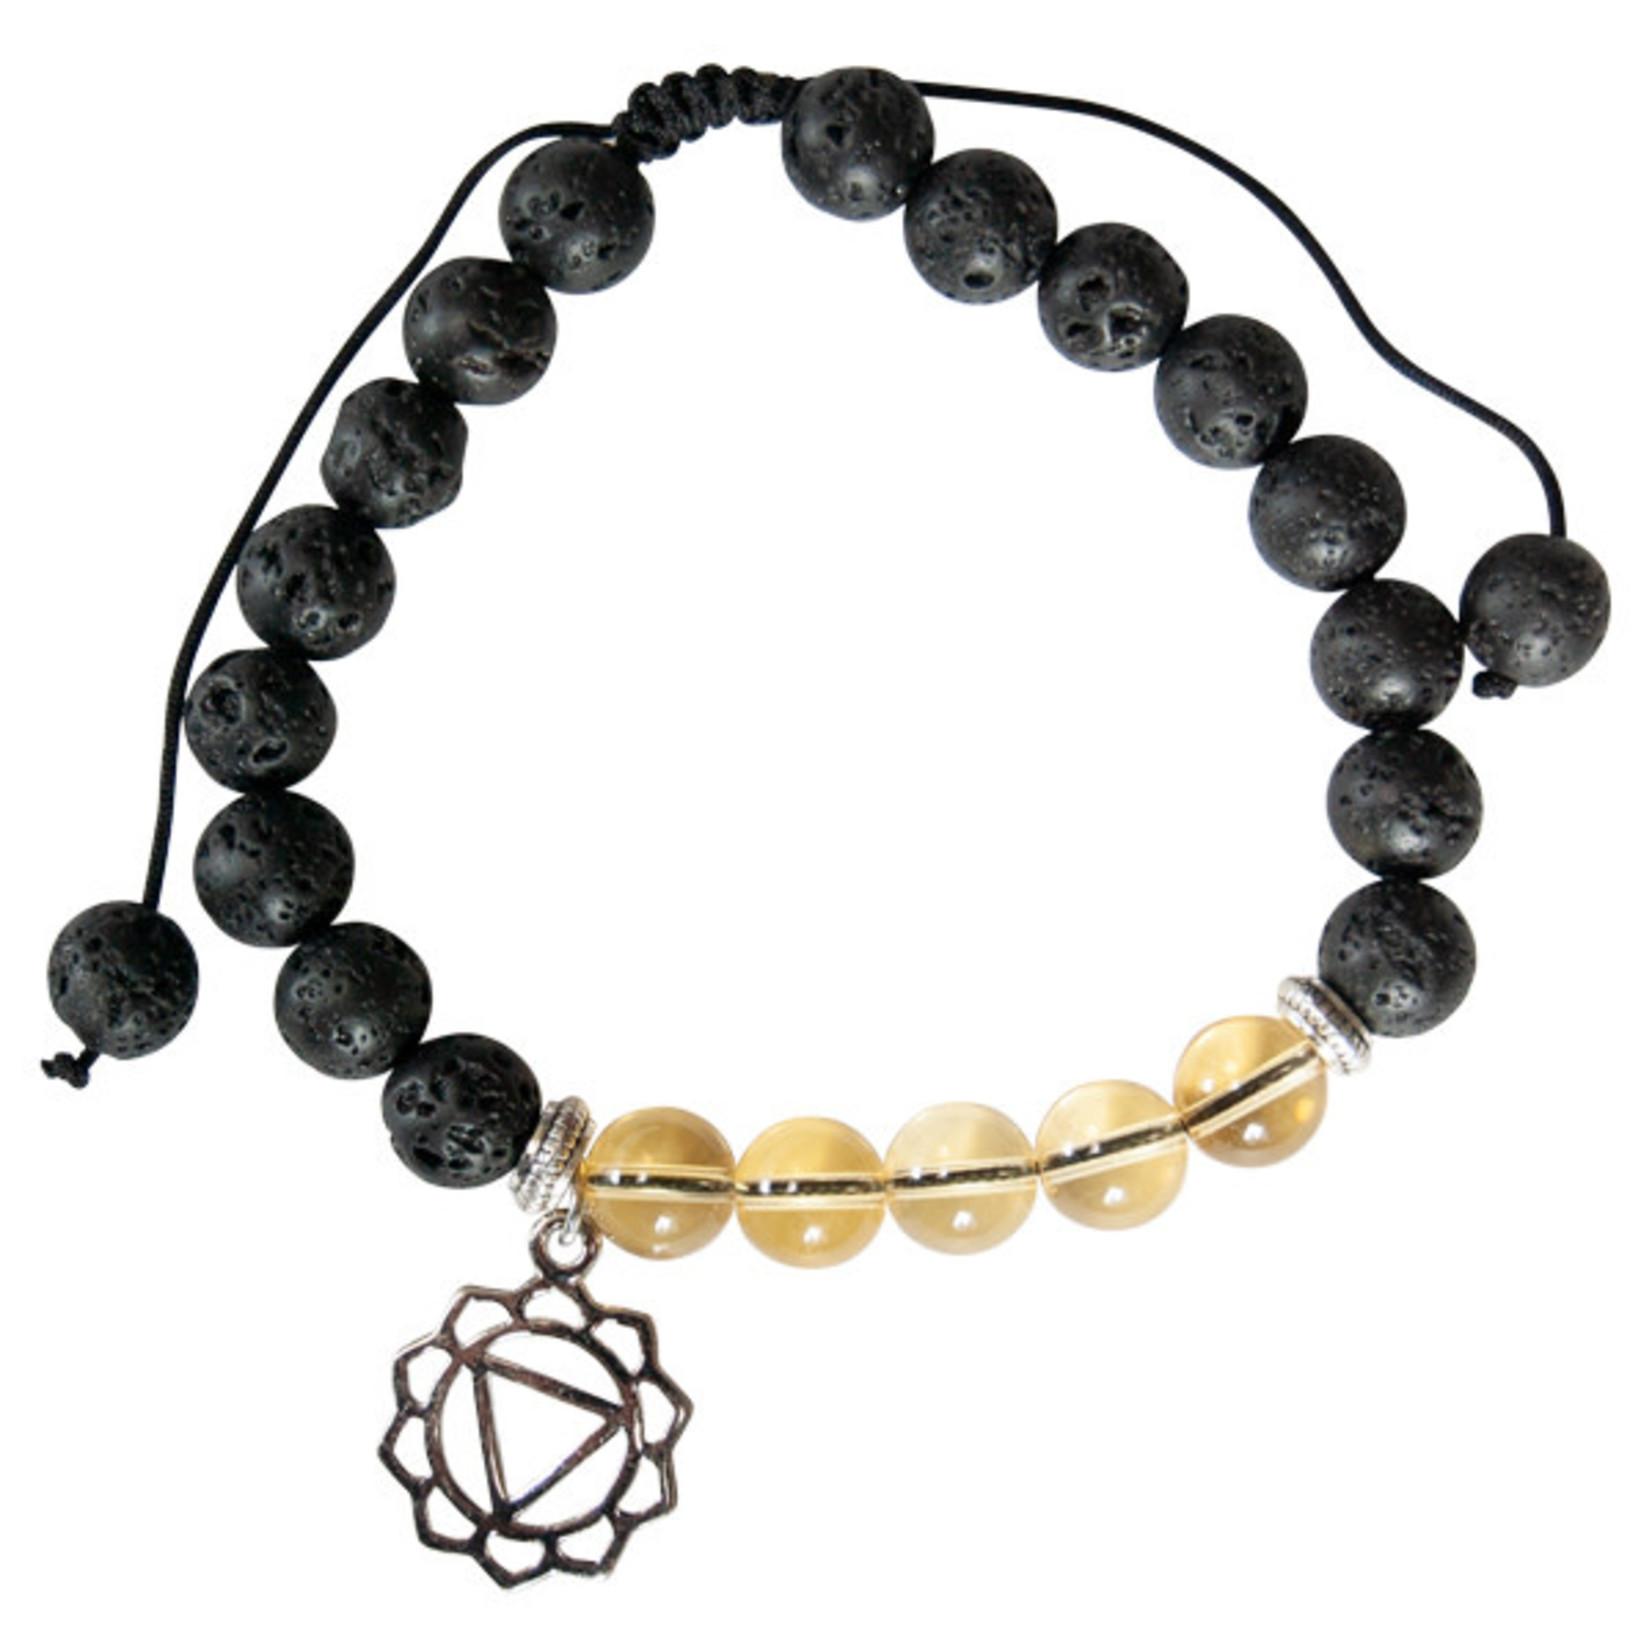 Citrine (Solar Plexus) Bracelet